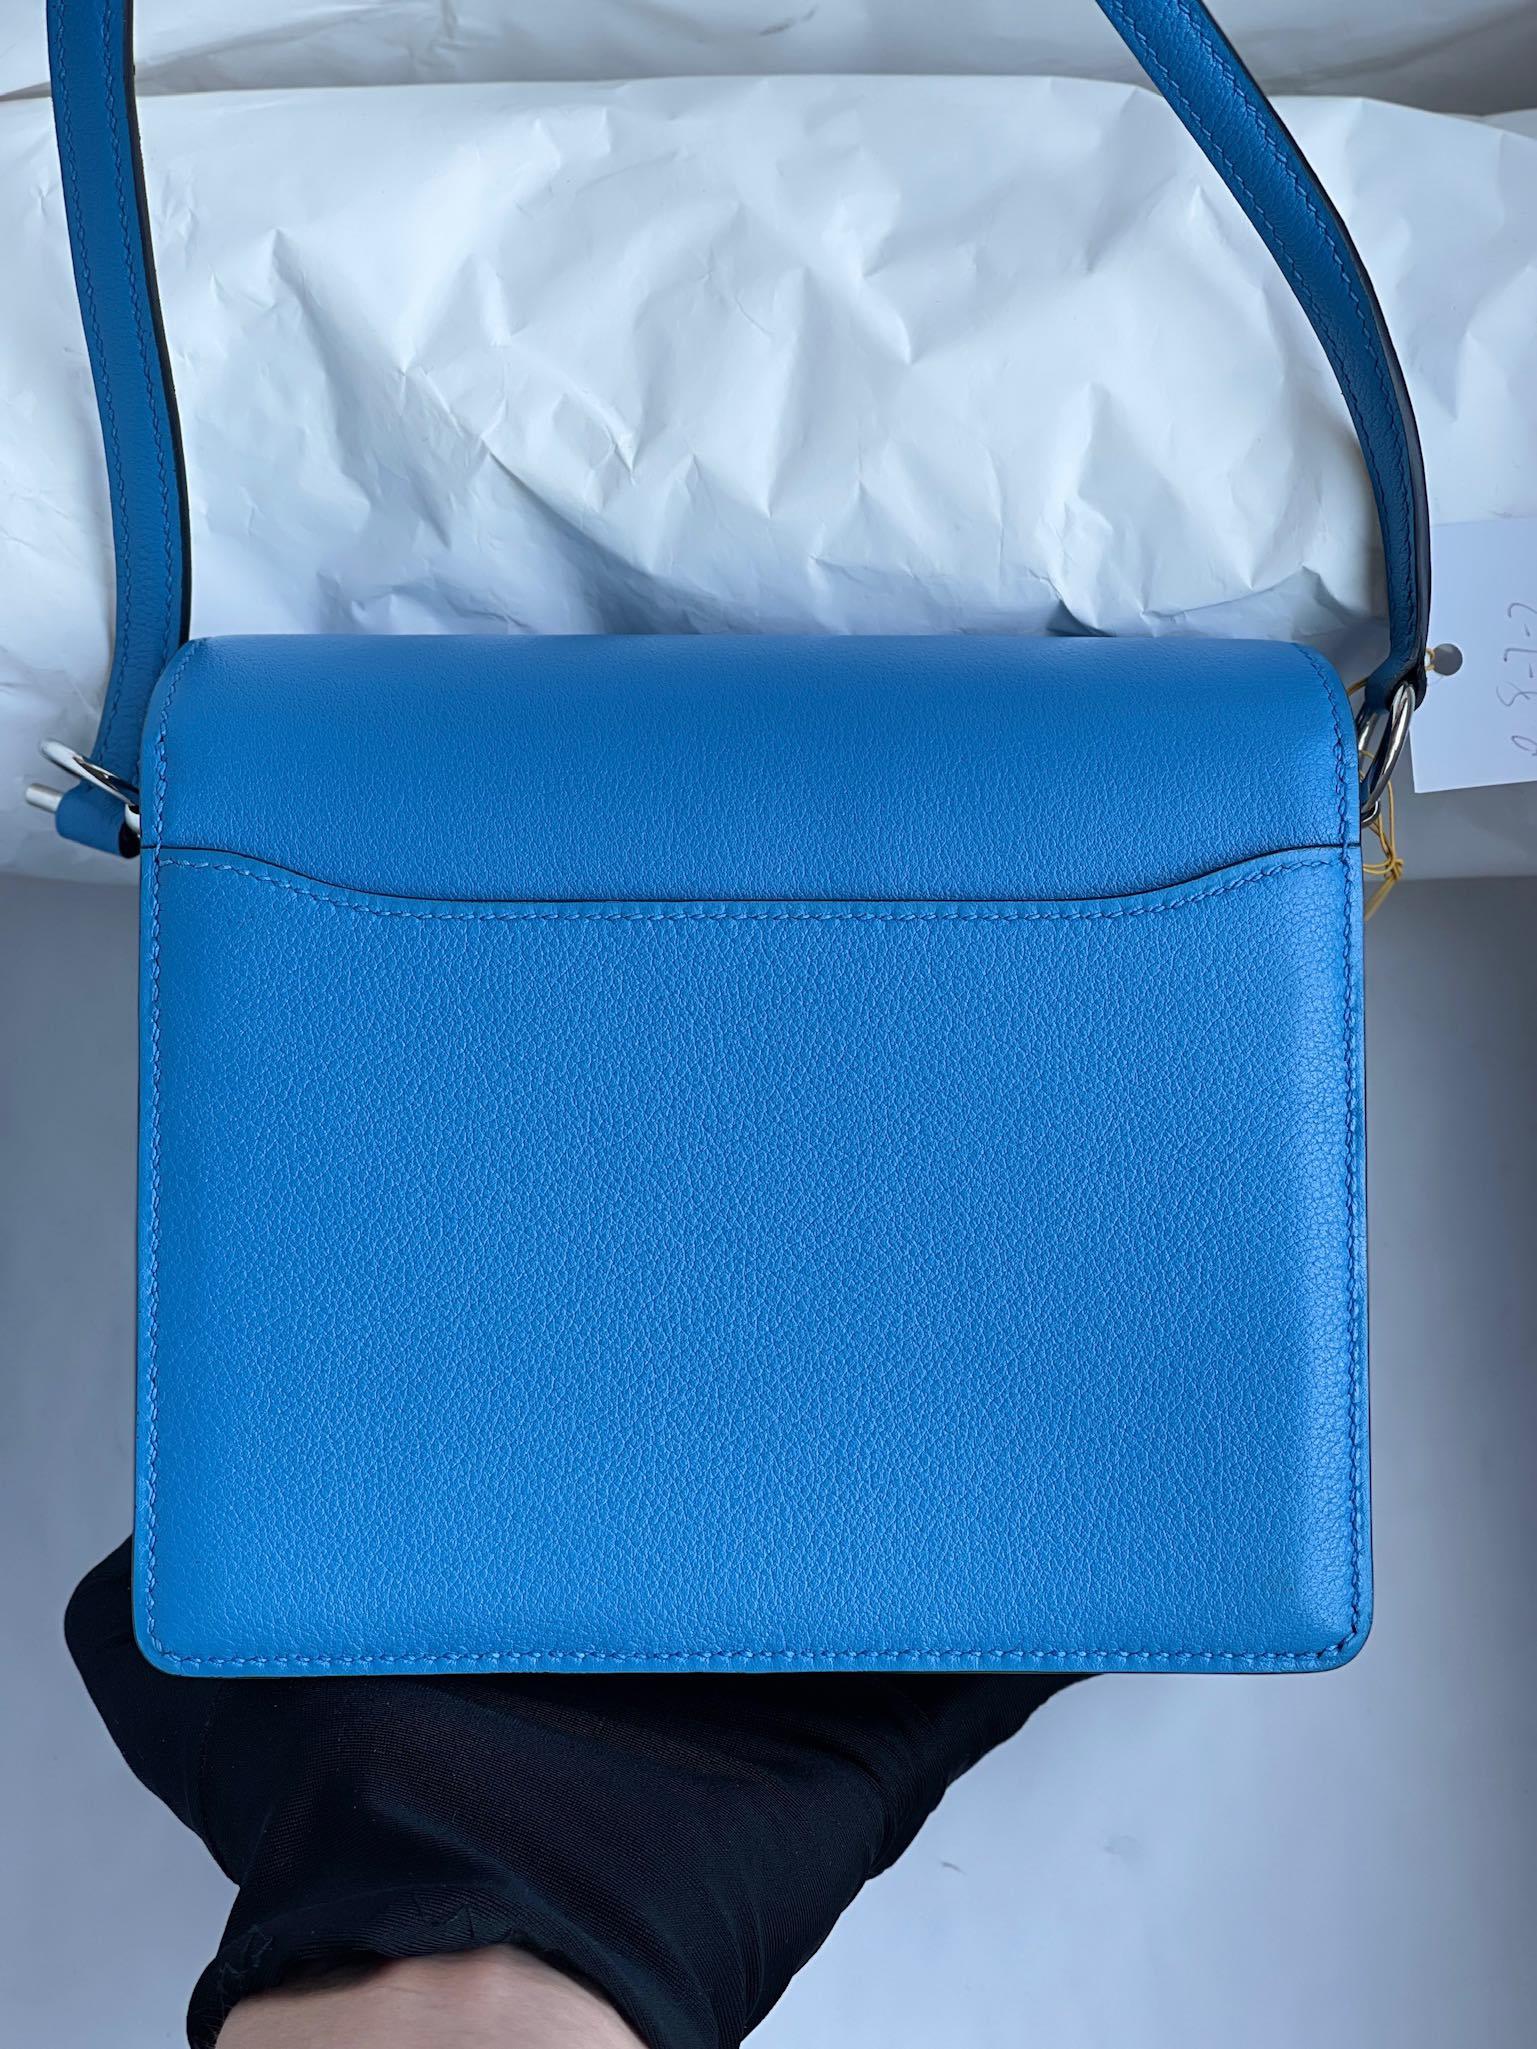 Hermès(爱马仕)Roulis 猪鼻子 evecolor 水妖蓝 内拼 心红色 银扣 18cm 顶级手缝